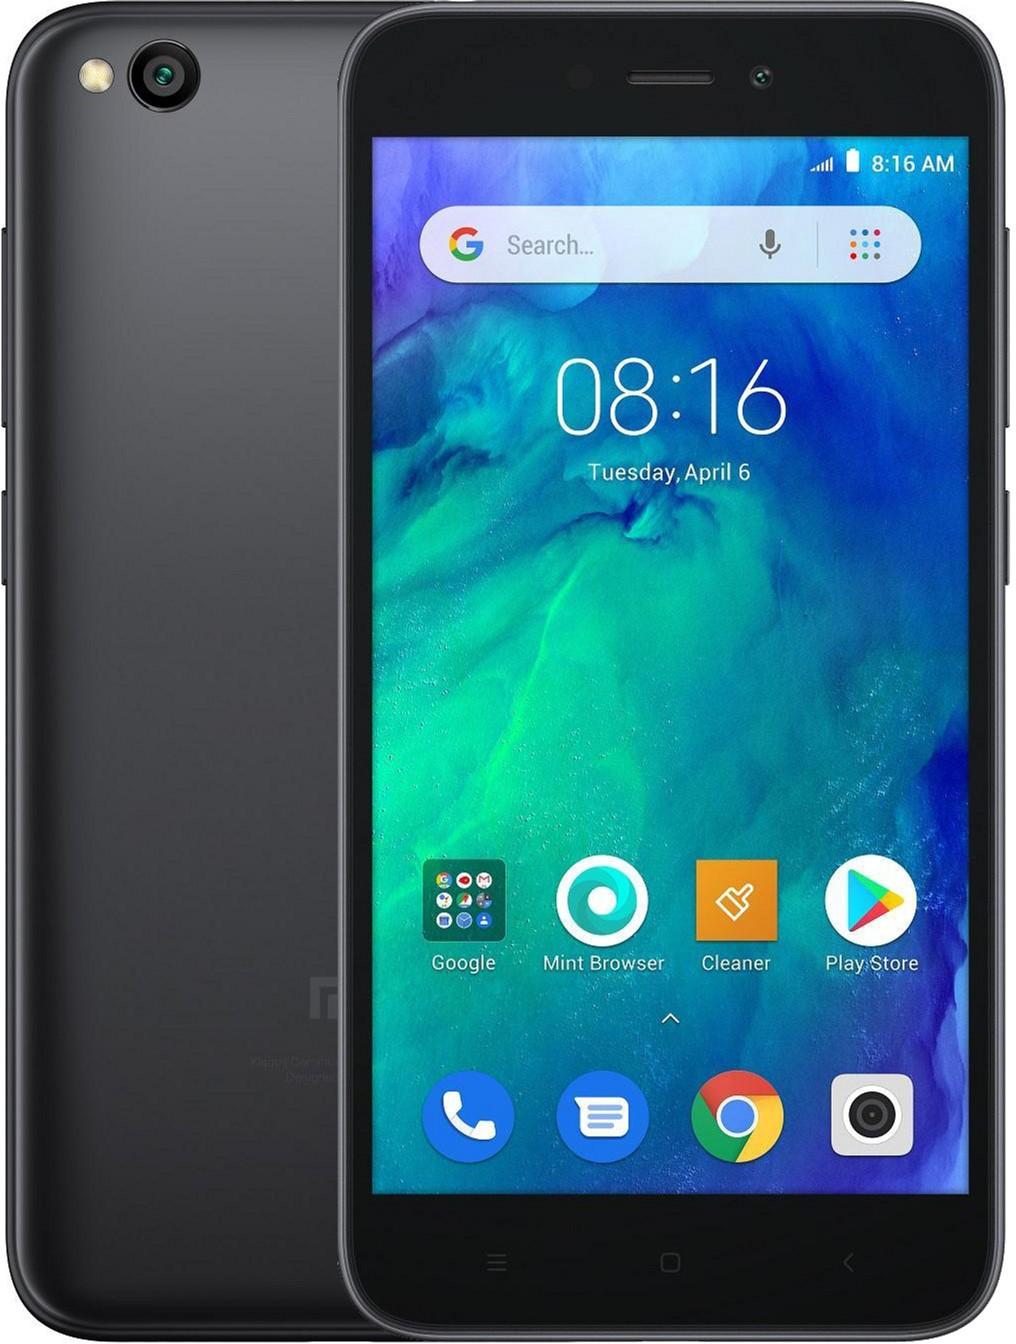 Xiaomi Redmi Go Dual SIM - 16GB, 1GB RAM, 4G LTE, Black Global Versia